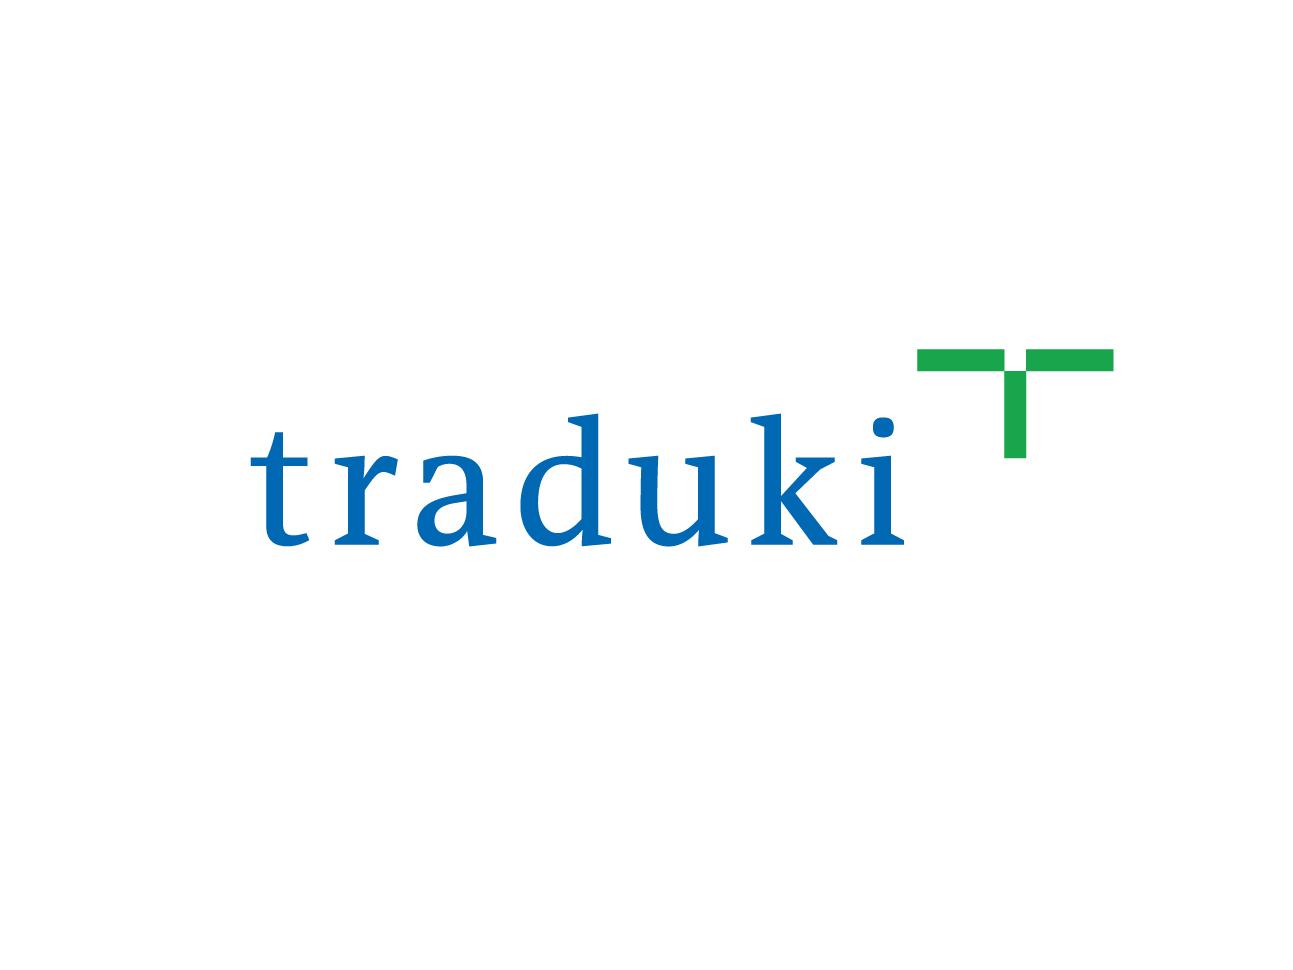 martin_zech_design_projekt_design_traduki_logo